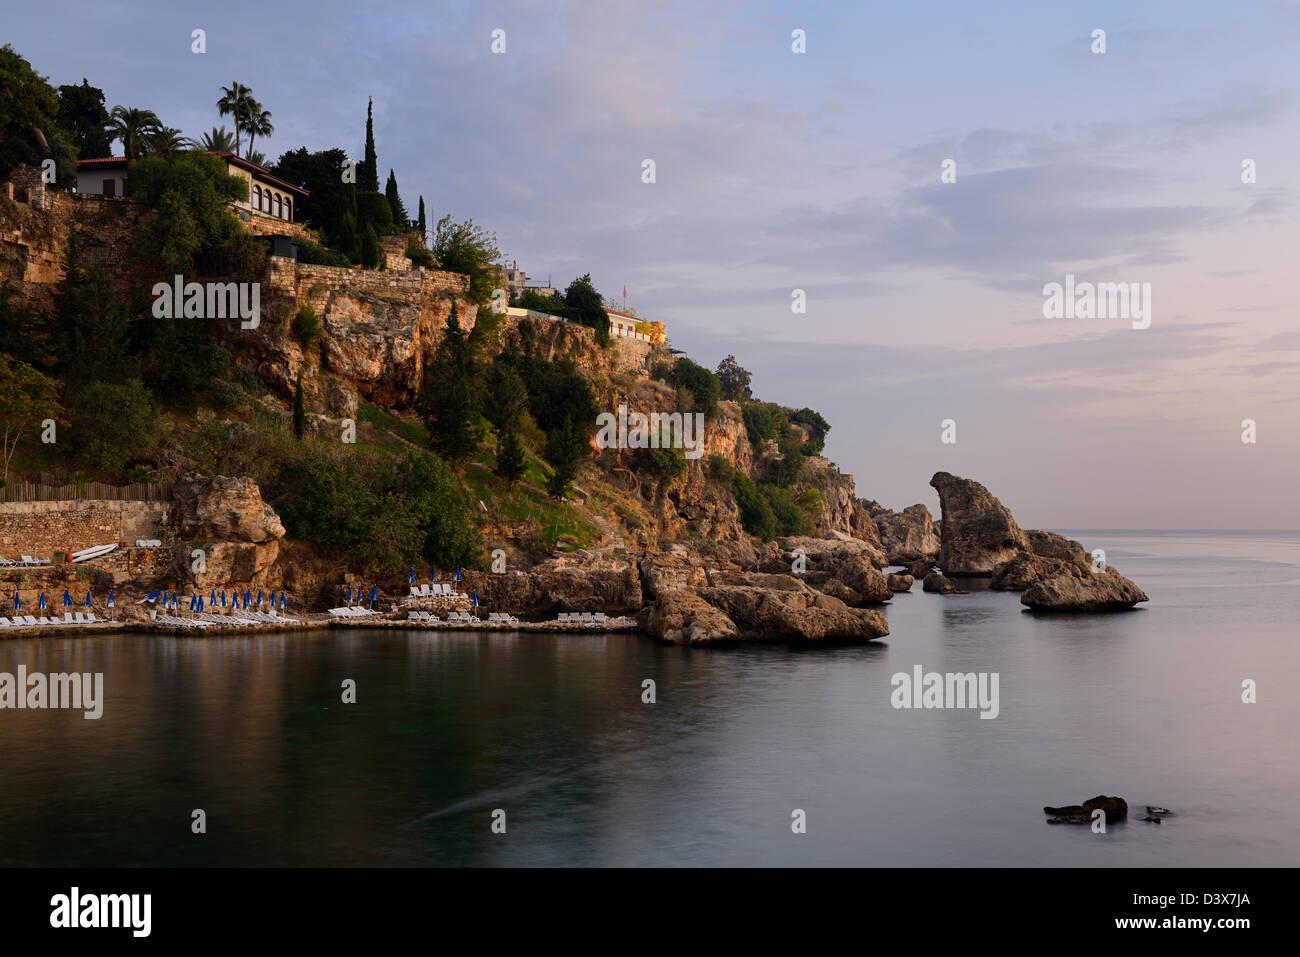 Cliffside resort at dusk on Turkish Riviera at Antalya Kaleici Harbour Turkey - Stock Image